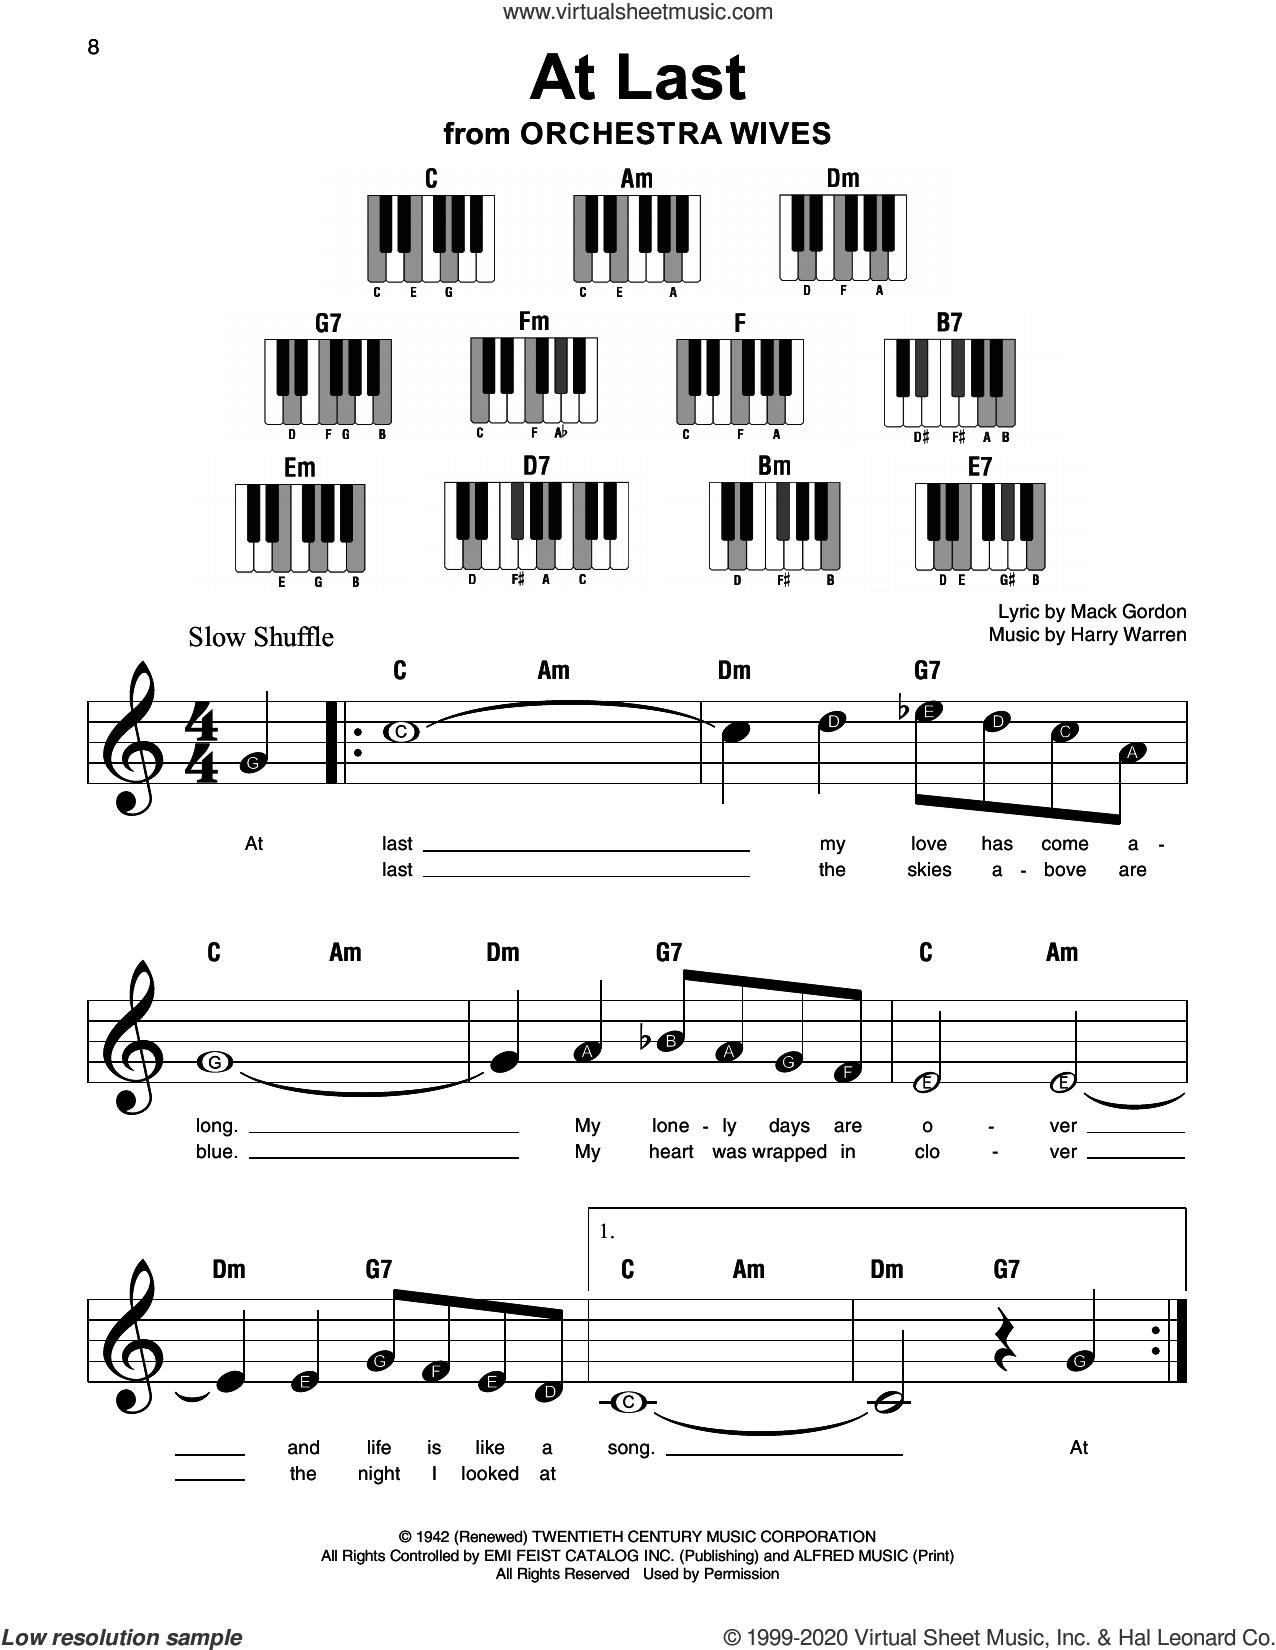 At Last sheet music for piano solo by Etta James, Harry Warren and Mack Gordon, beginner skill level